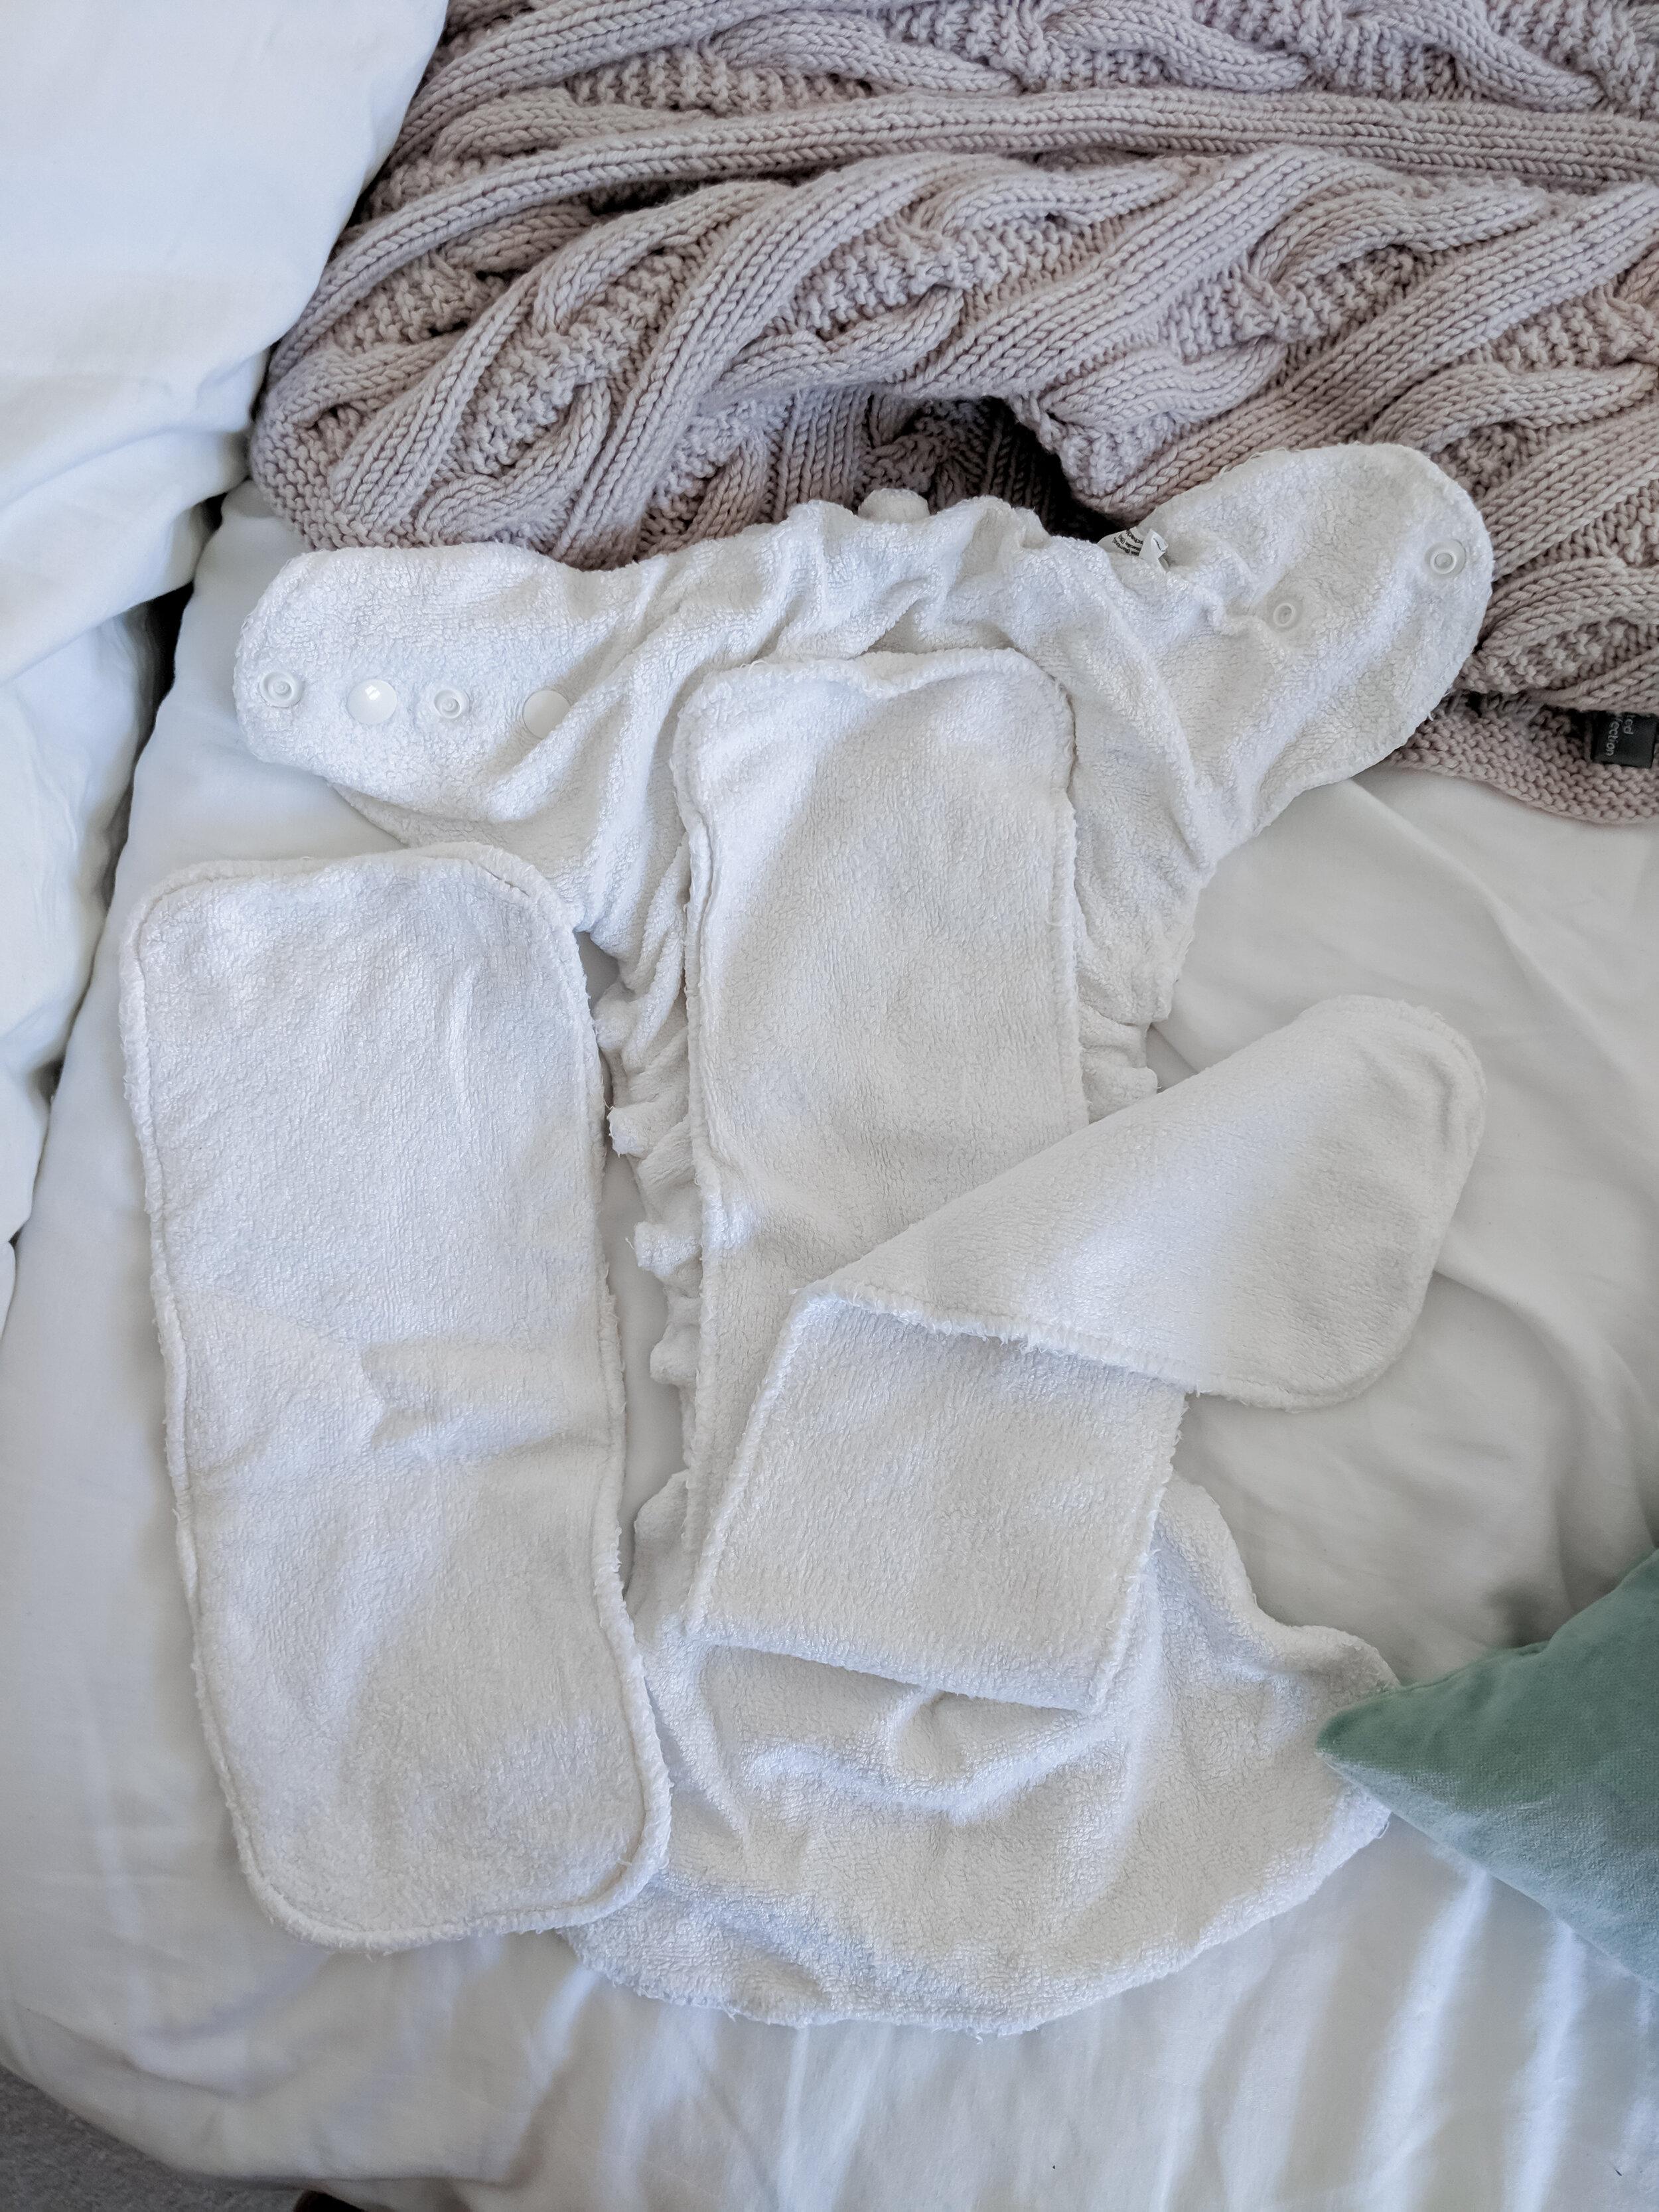 Petit Lulu Maxi Night fluffy organic fitted nappy in Faddy Pandas